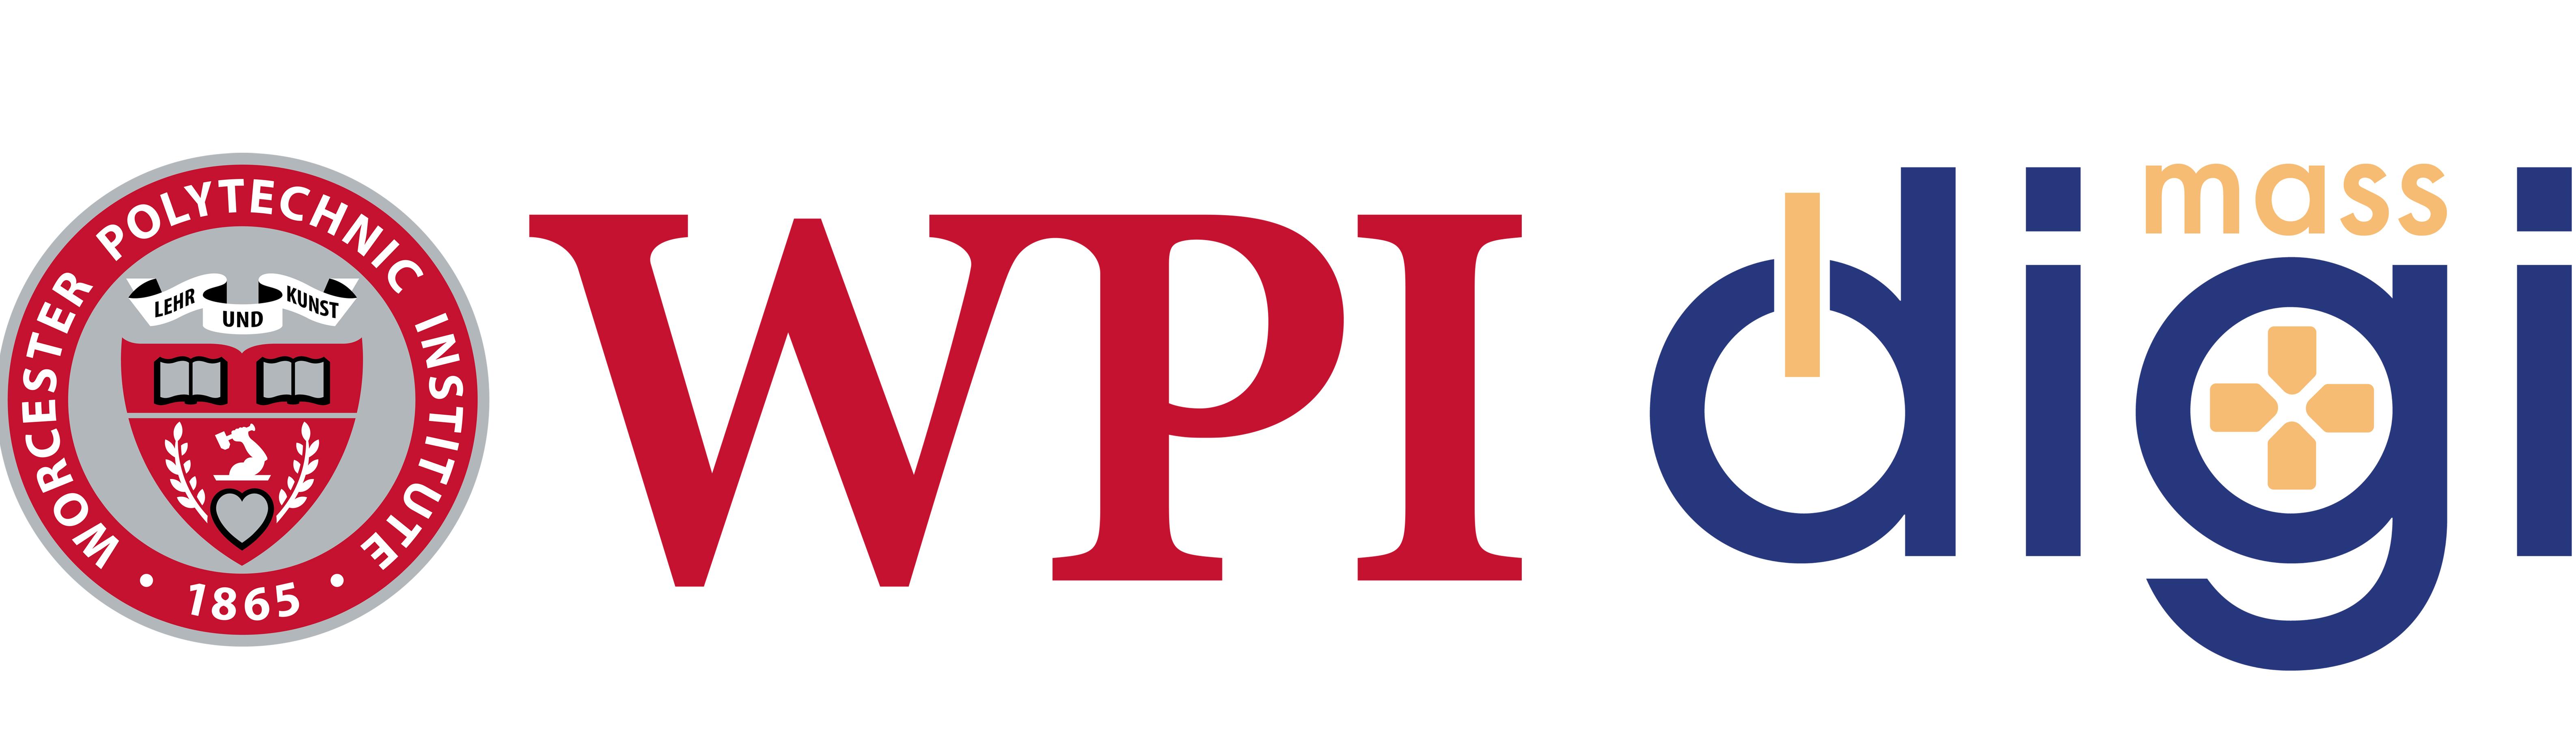 The WPI and MassDigi logos side by side.